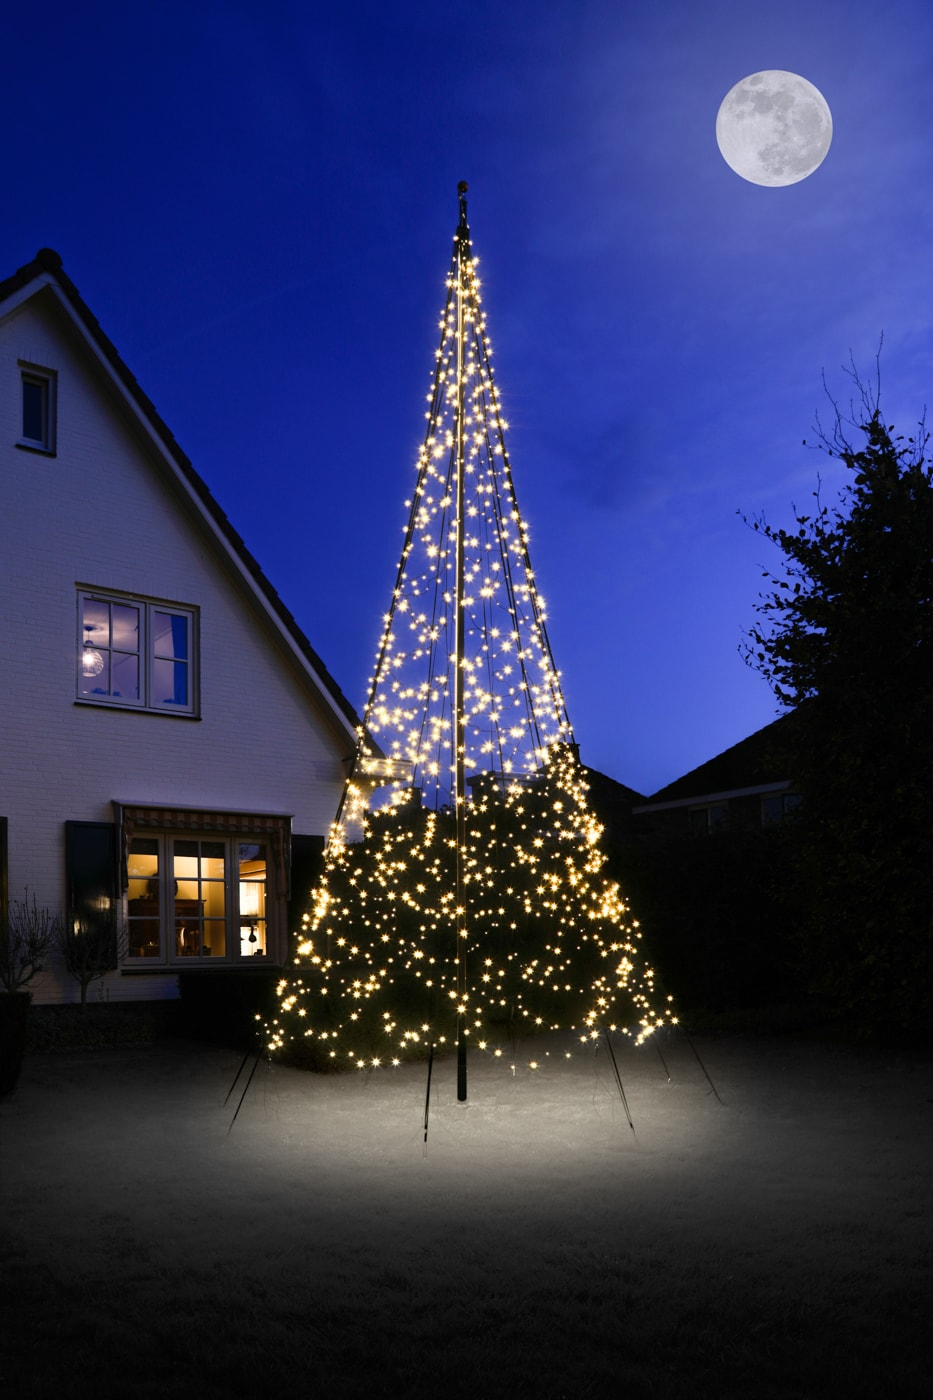 Fairybell 600 Cm 1200 Led Warm Wit Vlaggenmast Kerstverlichting